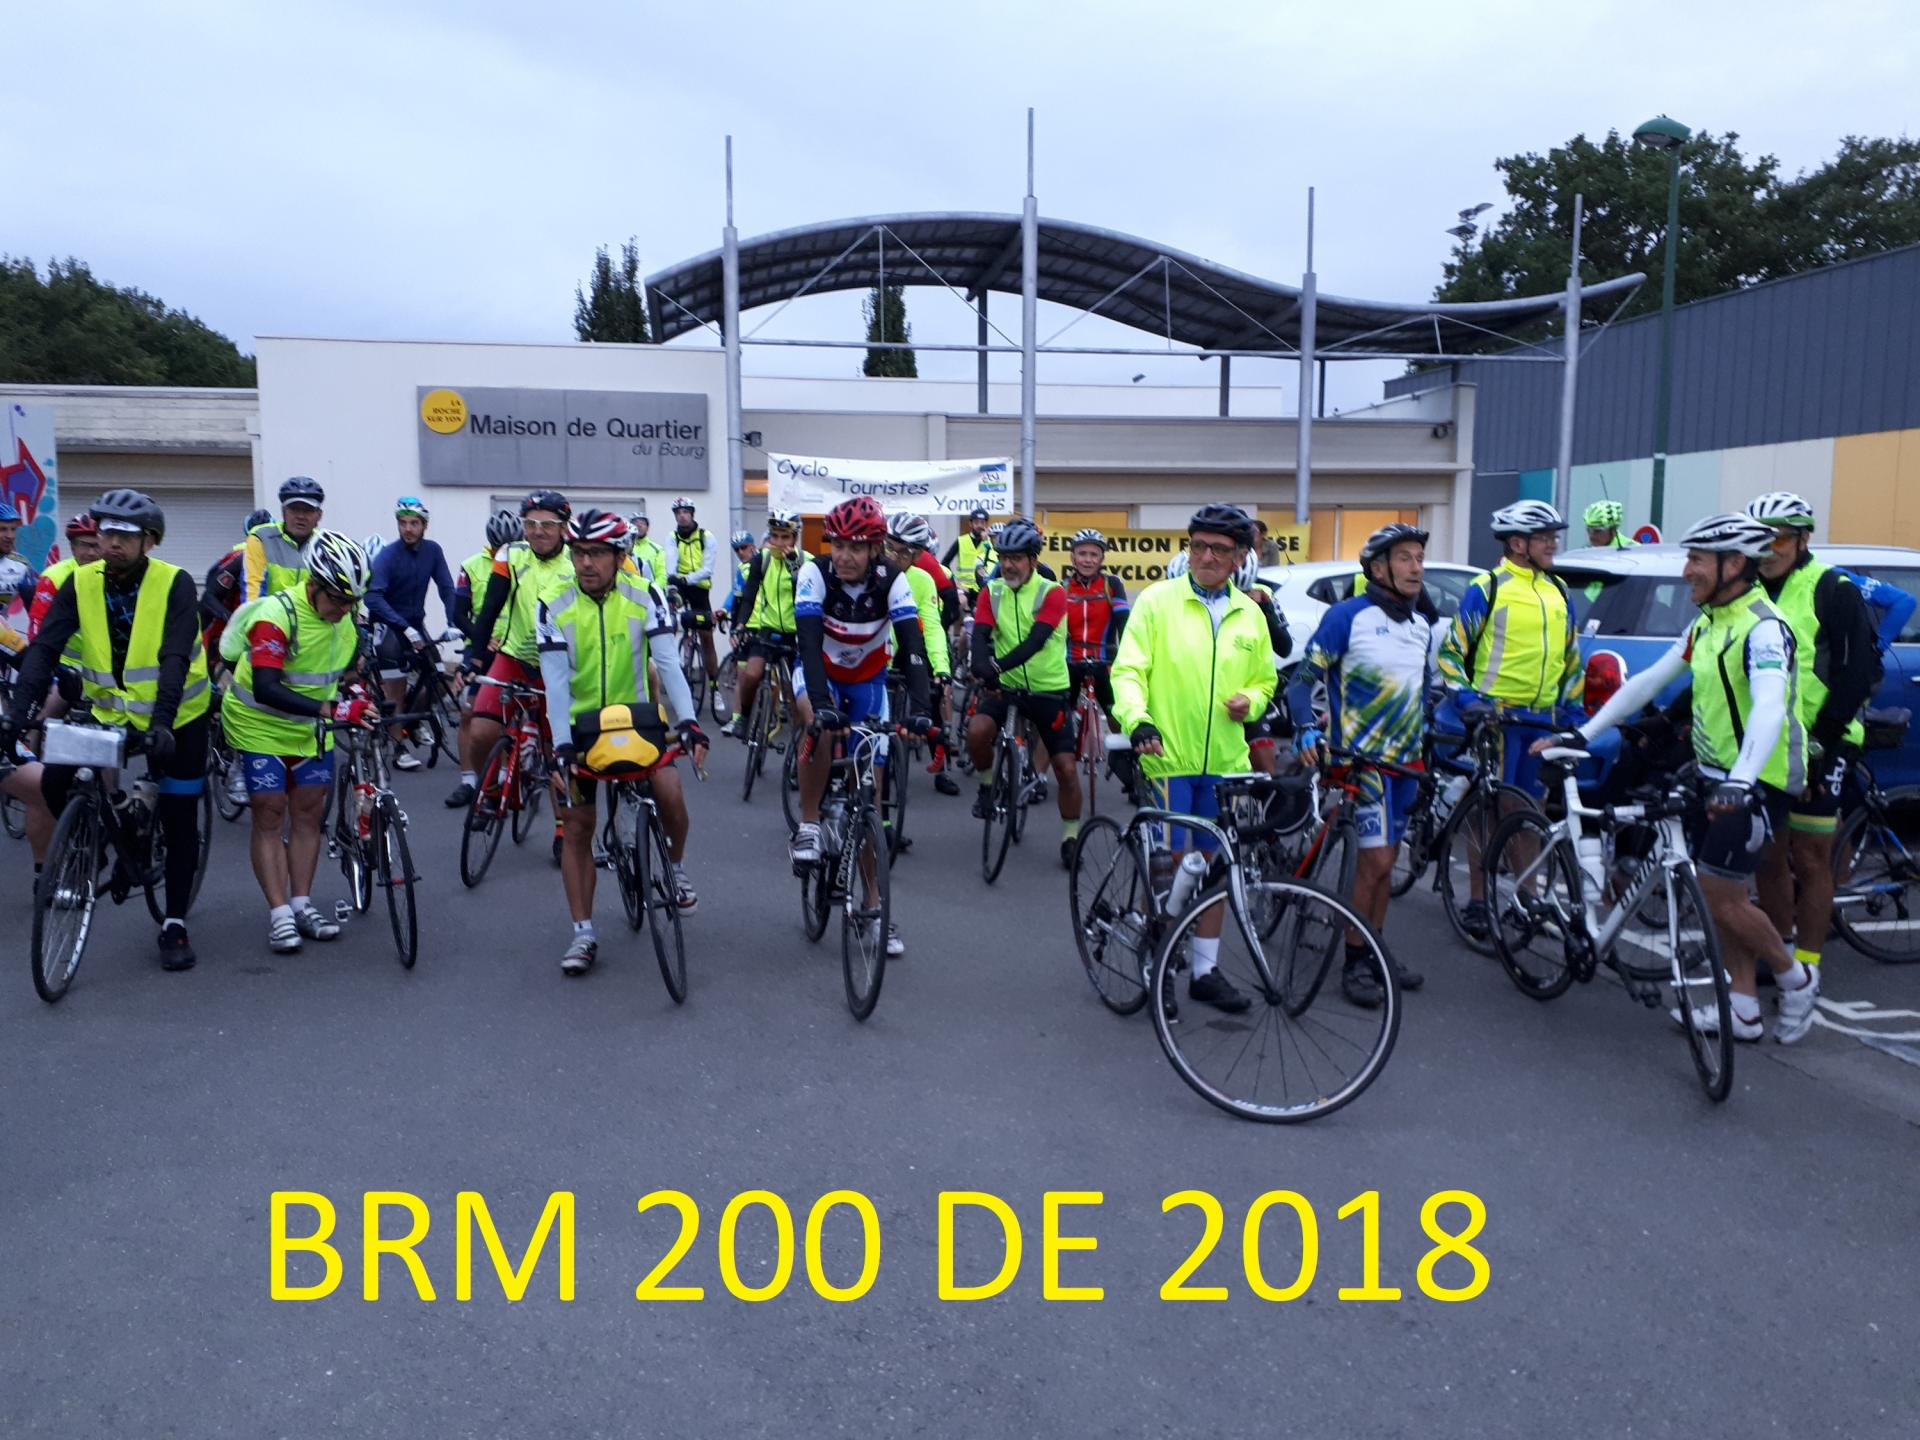 BRM 200 de 2018